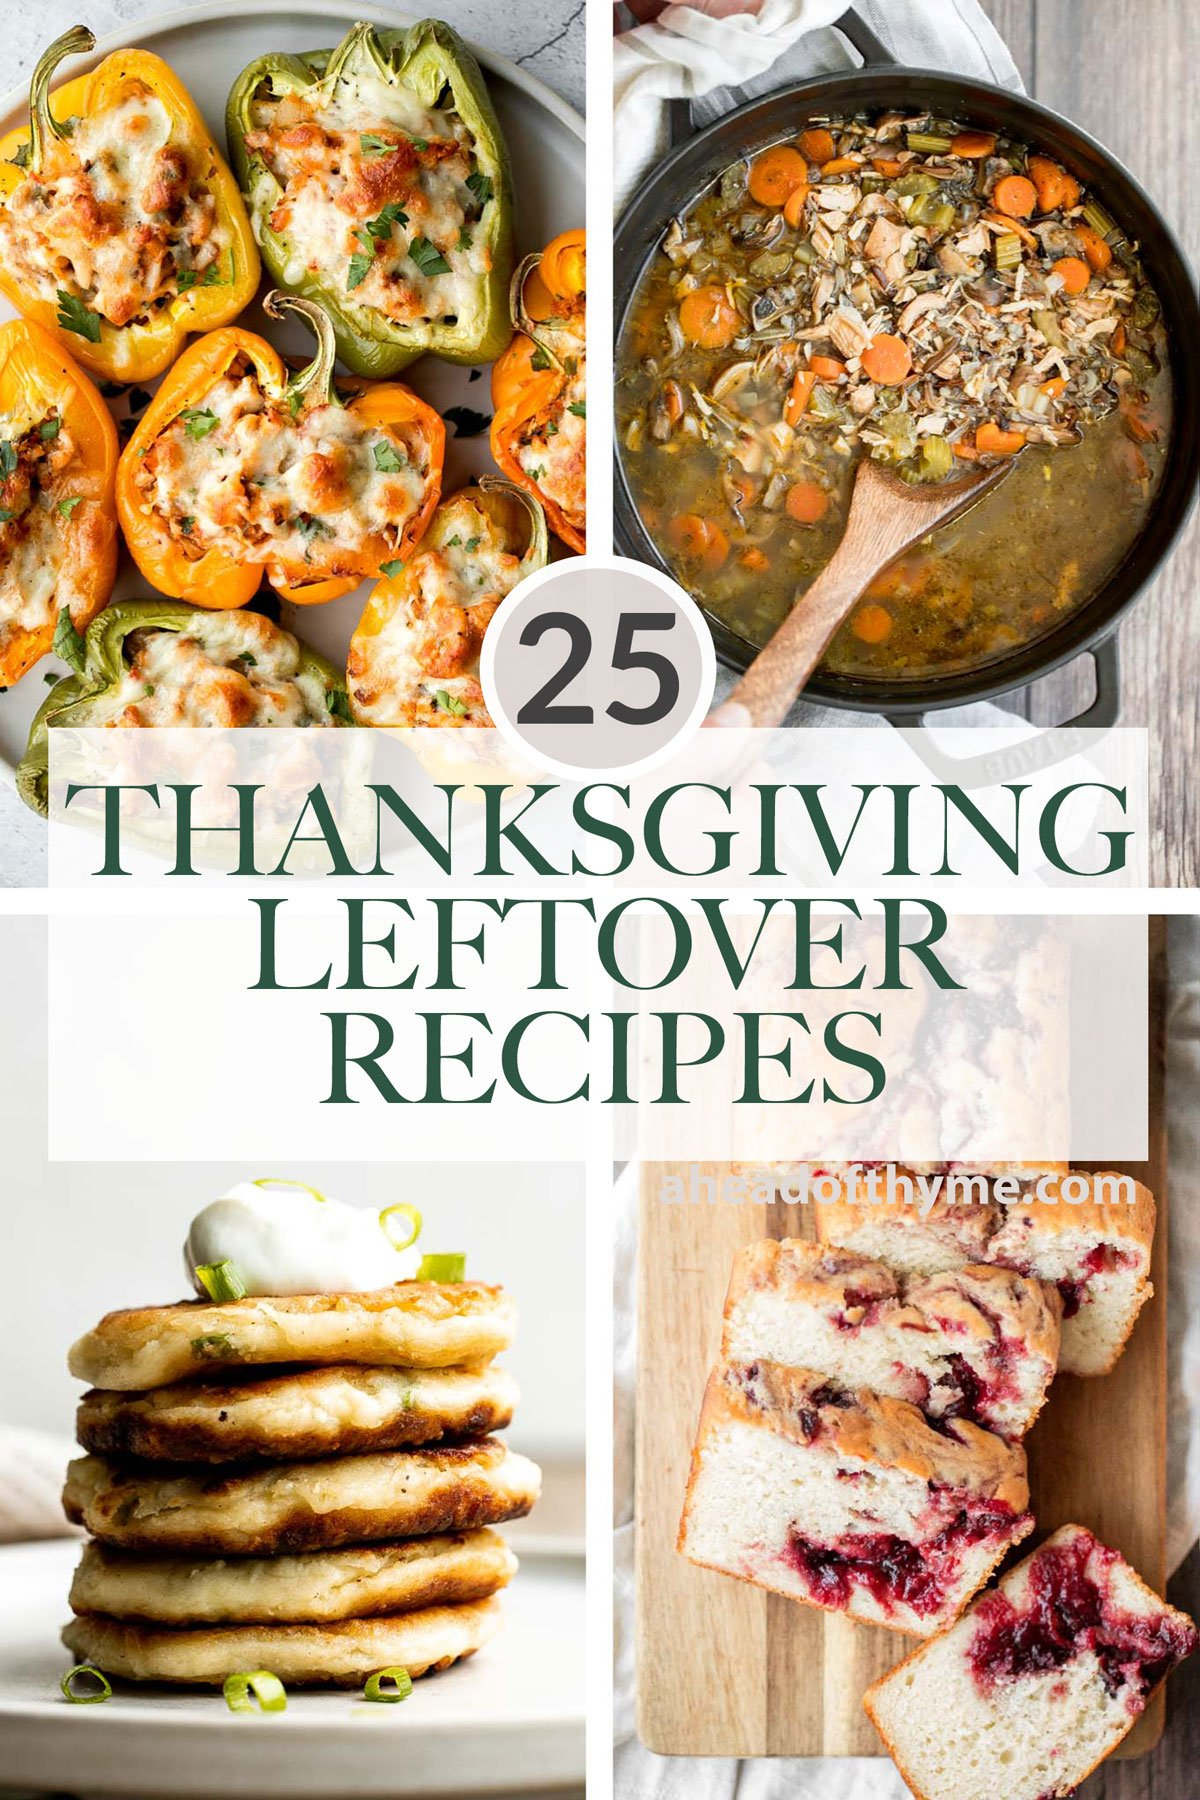 25 Best Thanksgiving Leftover Recipes